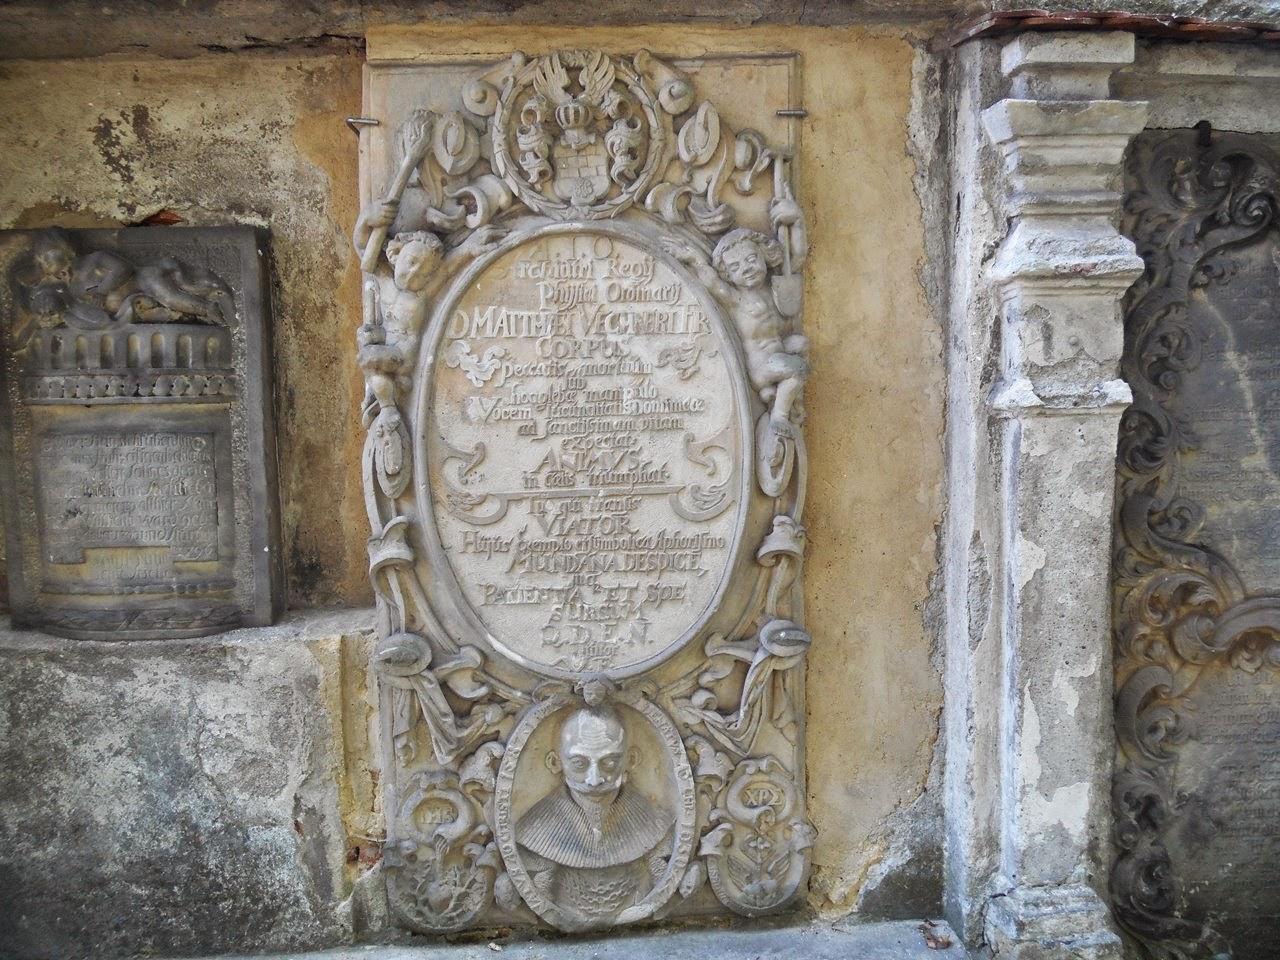 Cmentarz ewangelicki i jego zabytki.